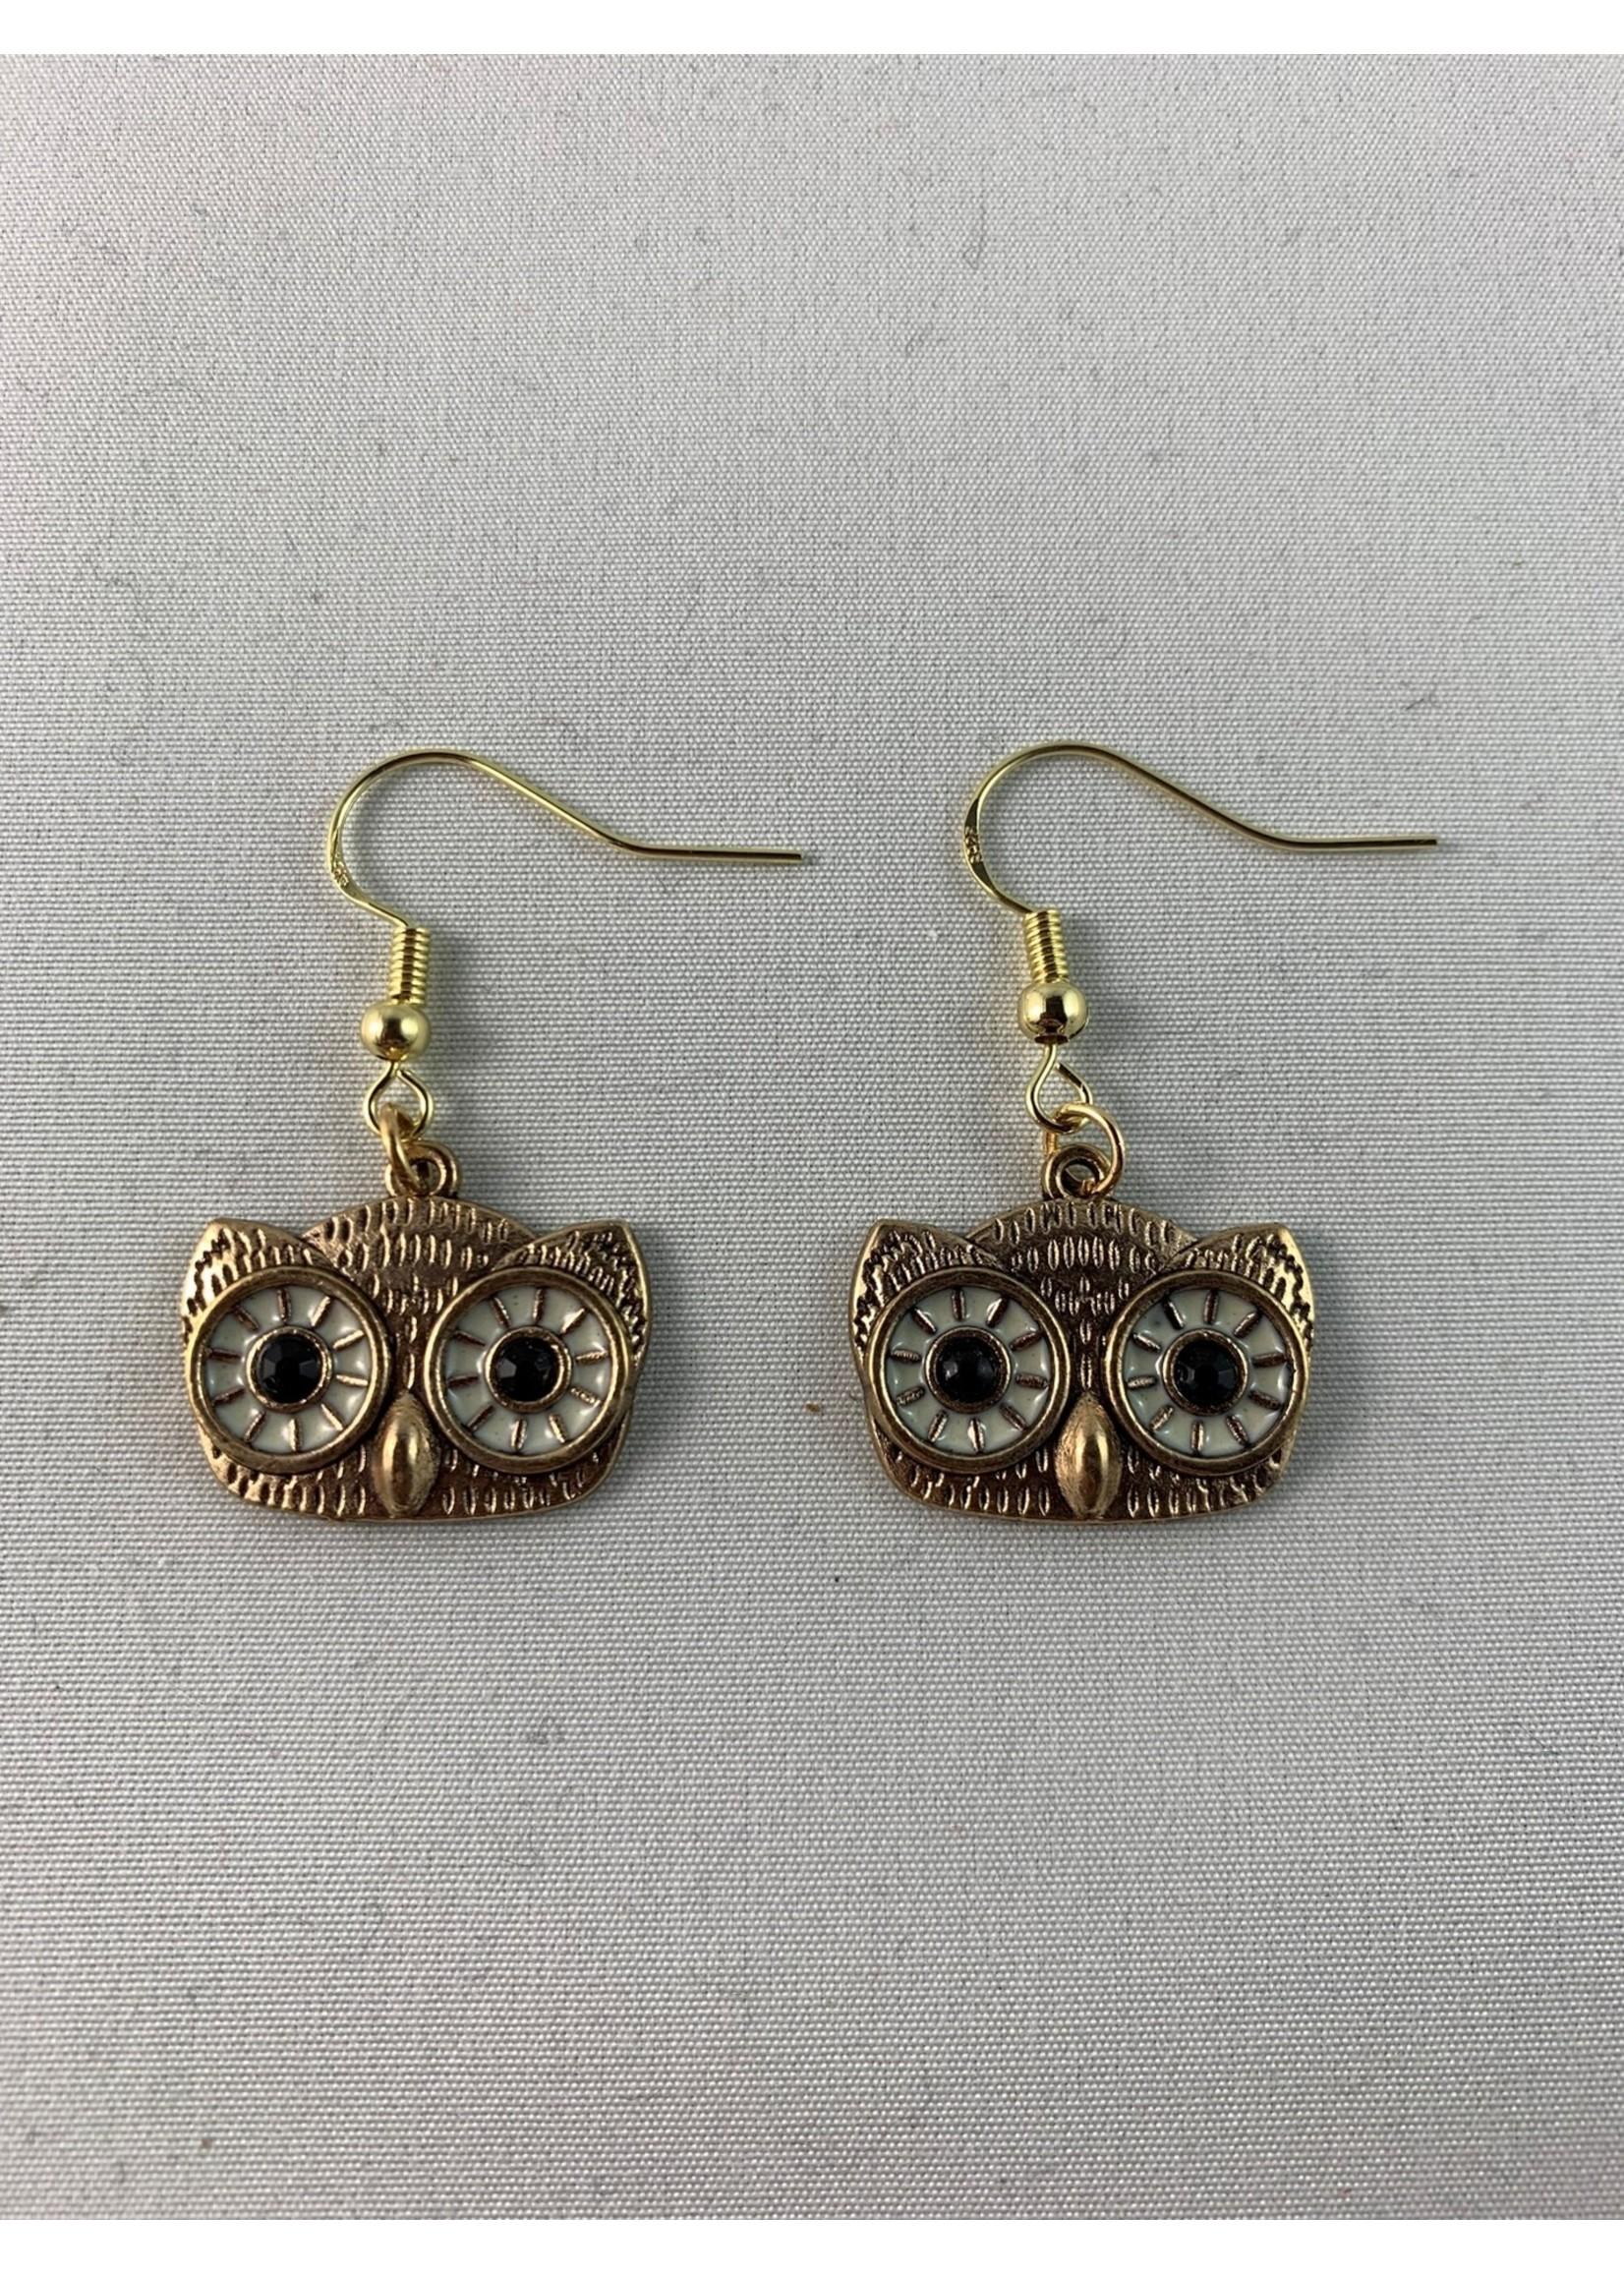 Earrings Owl Faces